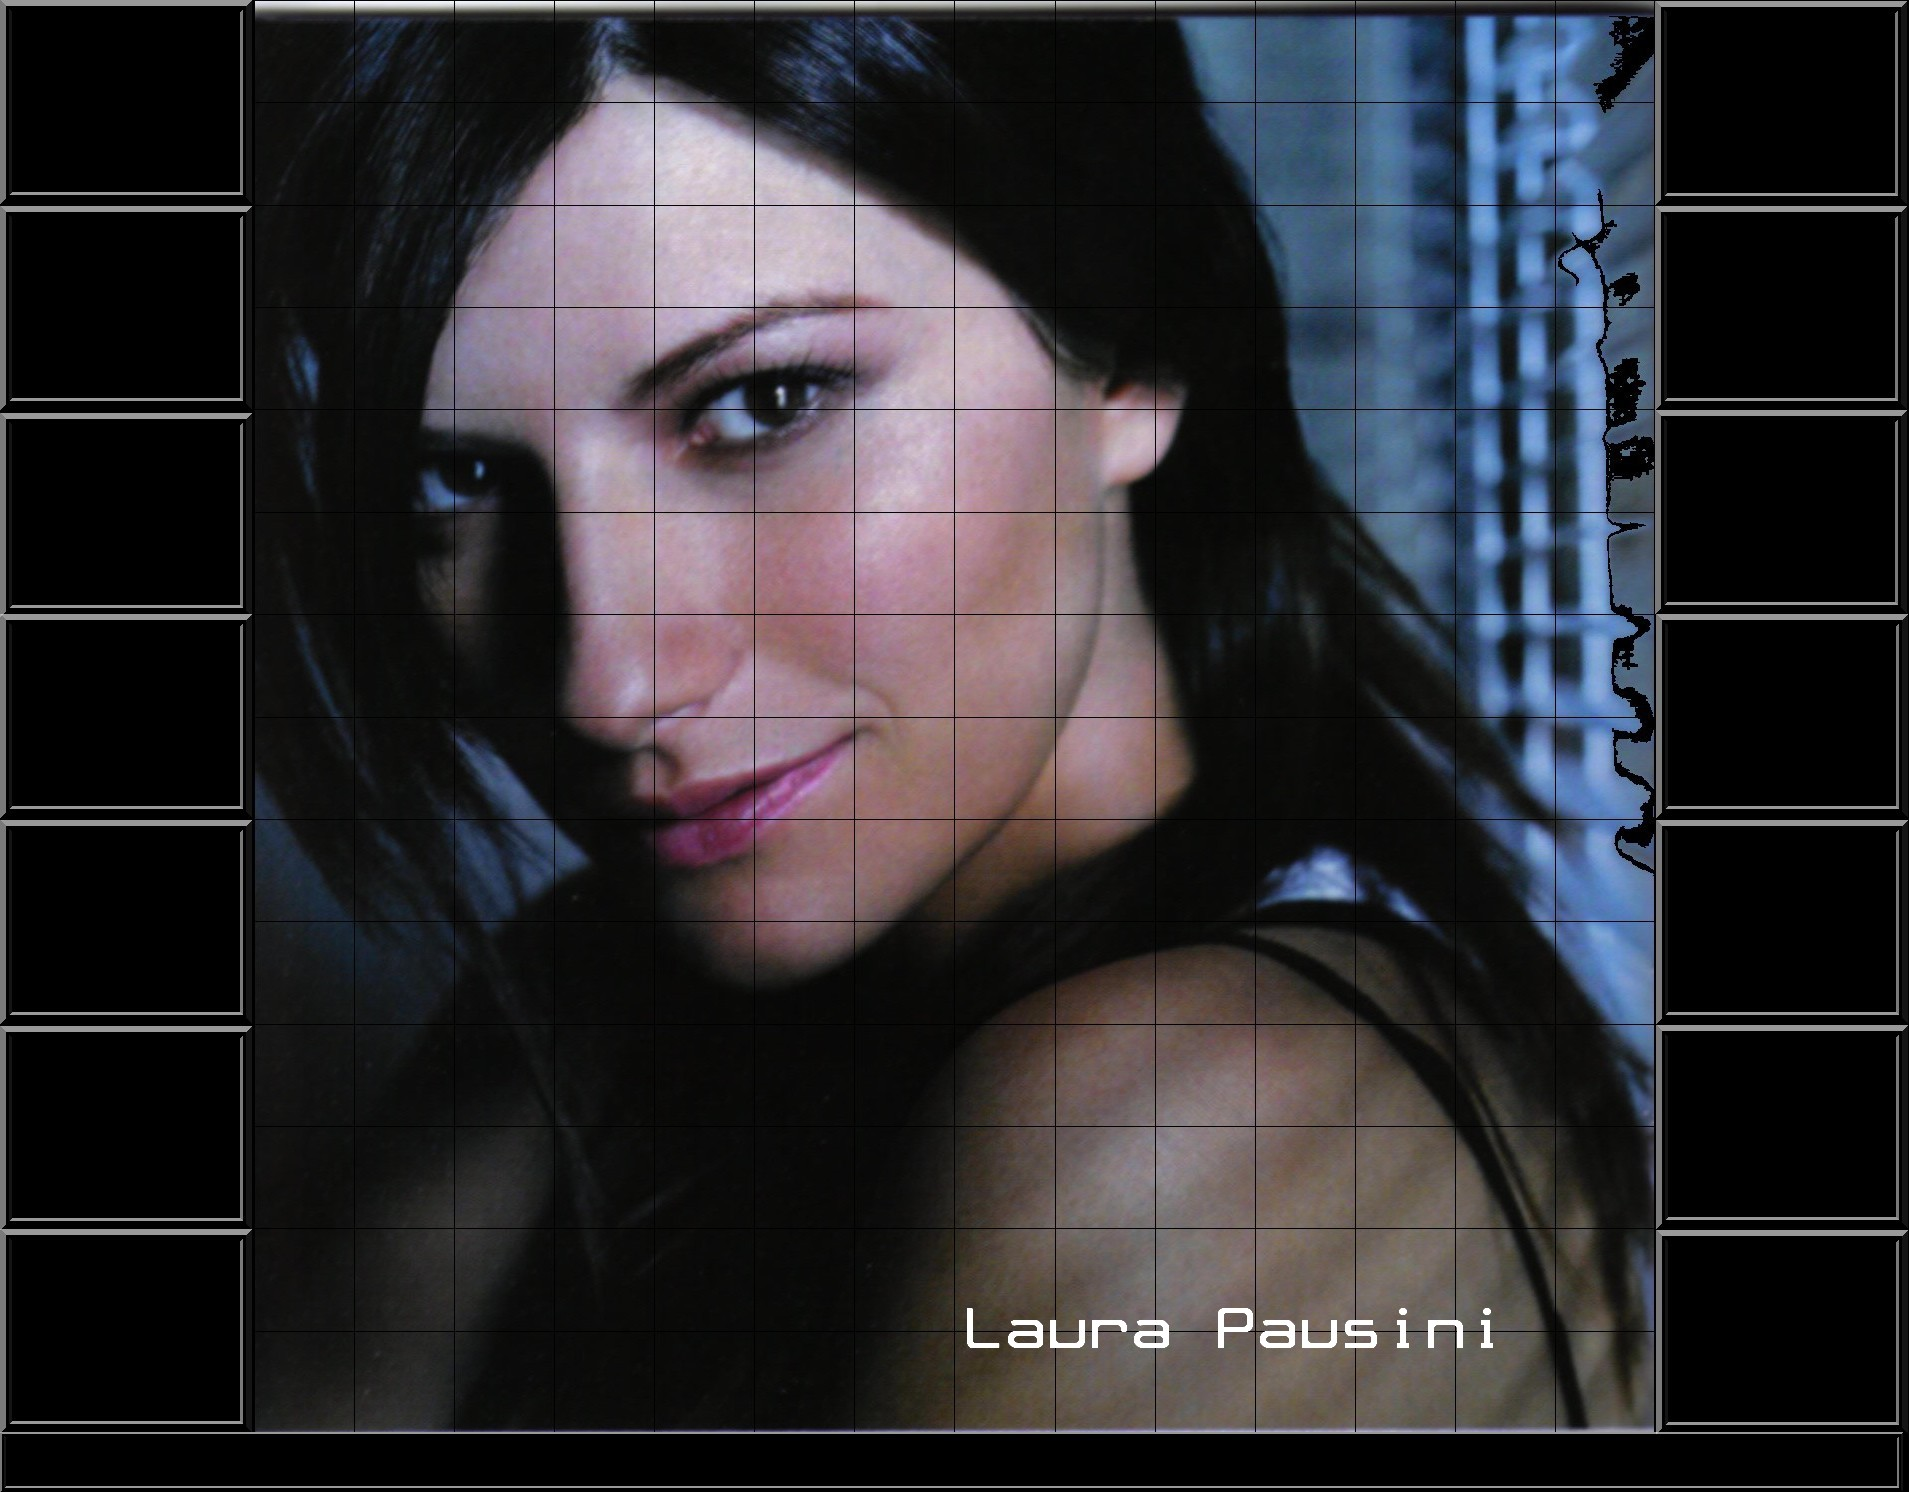 Laura Pausini Wallpapers